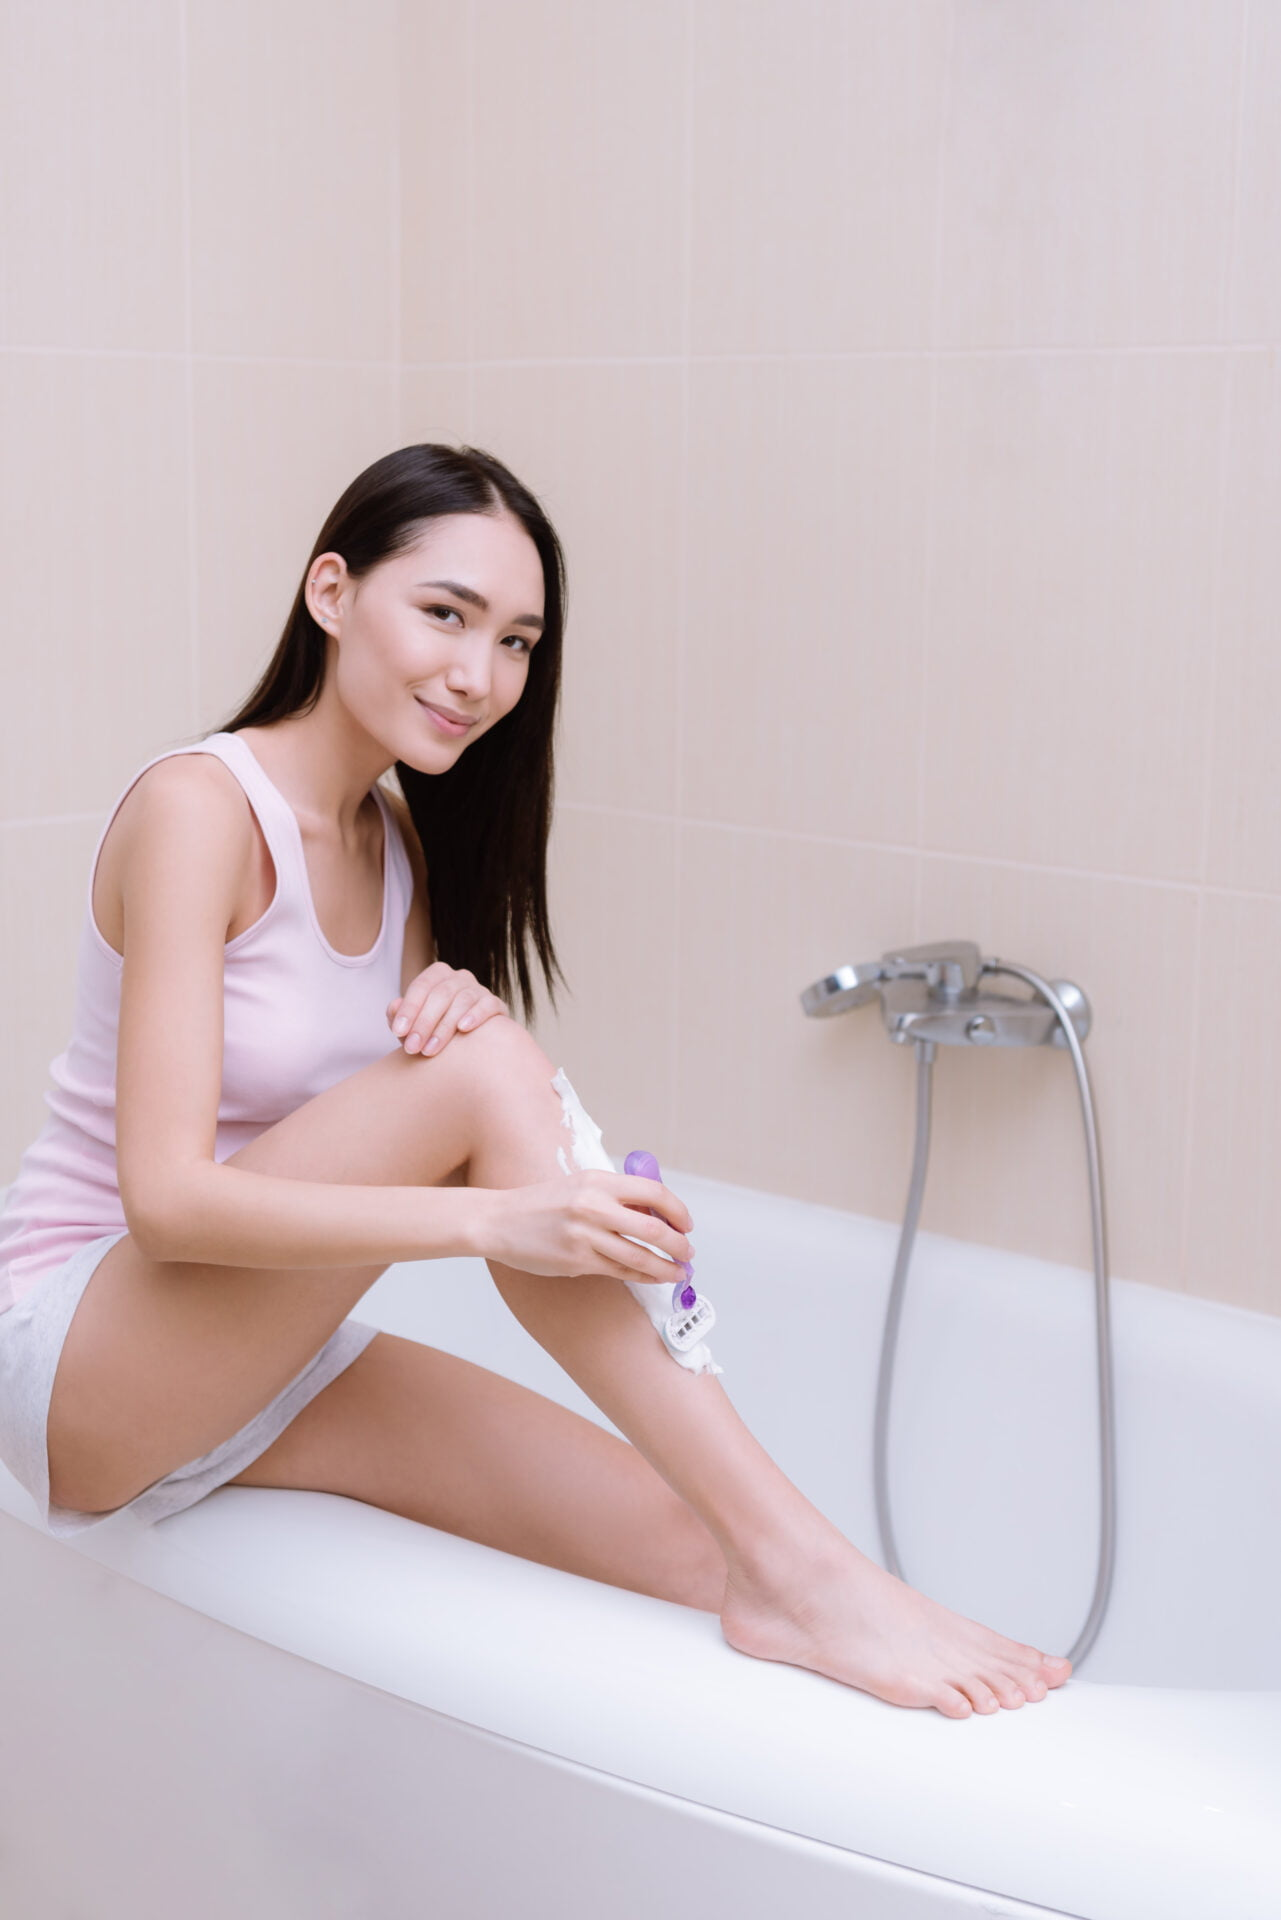 beautiful asian woman shaving her legs in bathtub